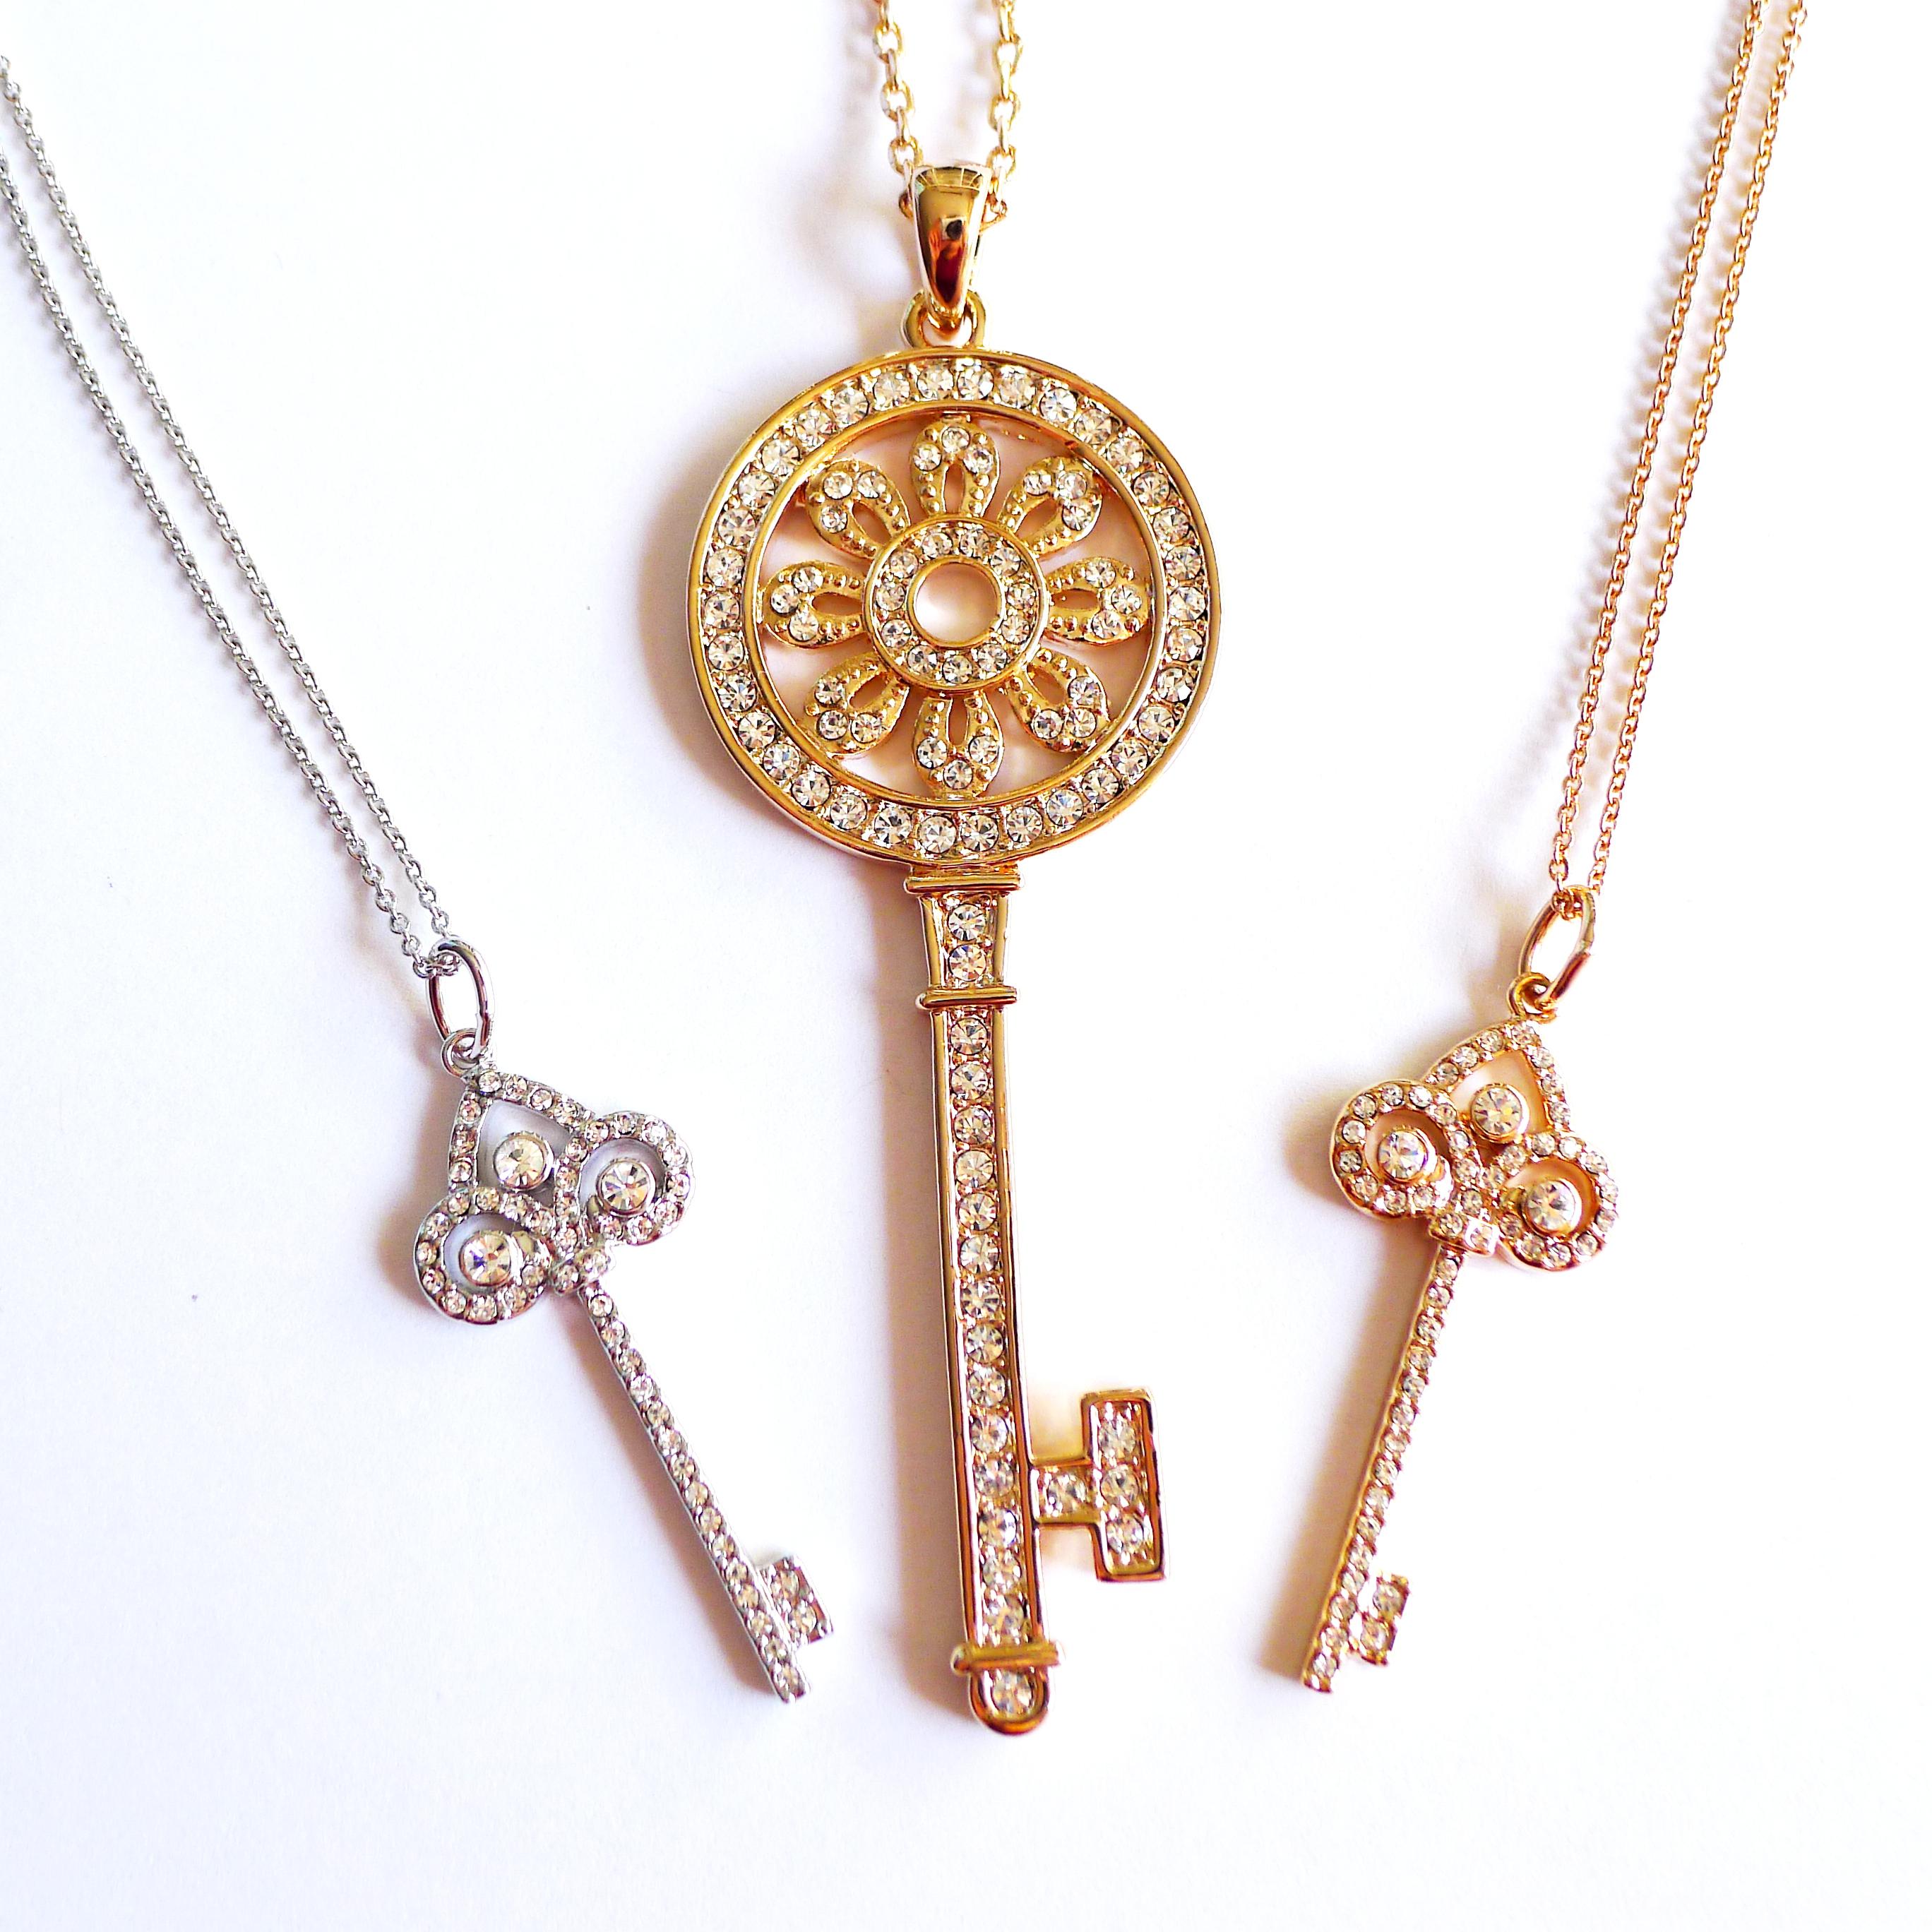 Smith chrysanthemum key necklace with extra long rose gold chain smith chrysanthemum key necklace with extra long rose gold chain thumbnail 1 mozeypictures Choice Image